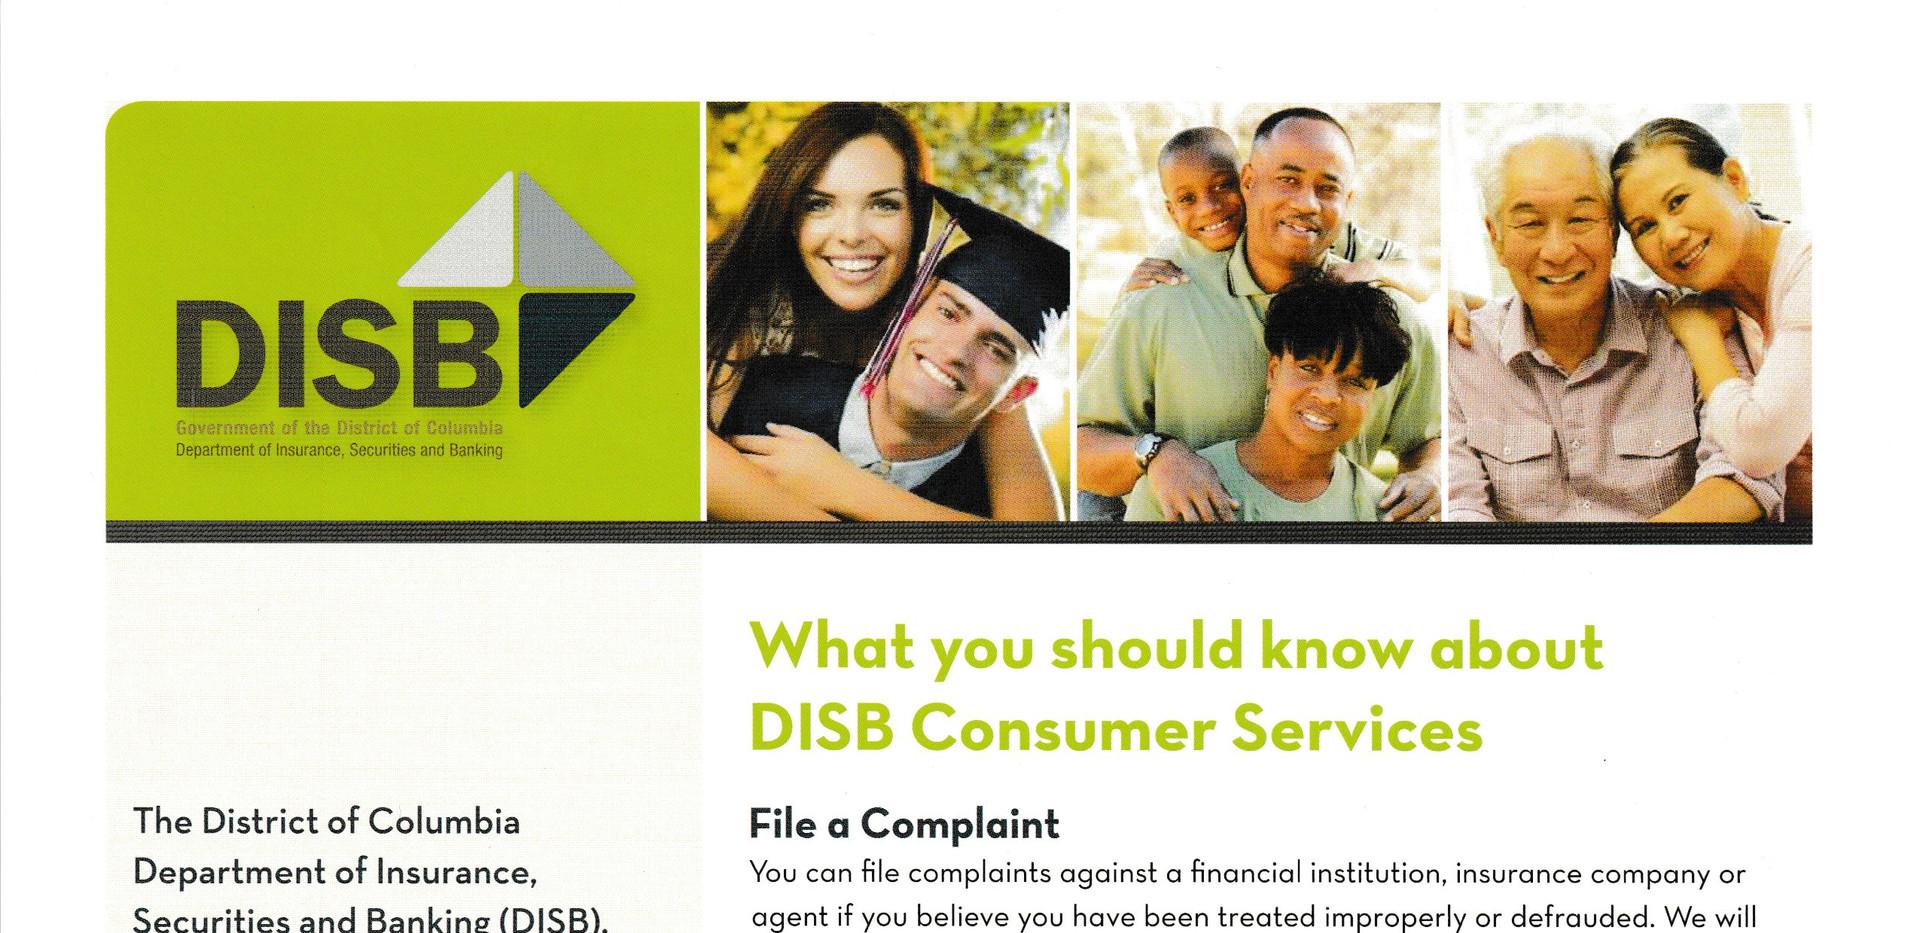 DISB Consumer Services 001.jpg